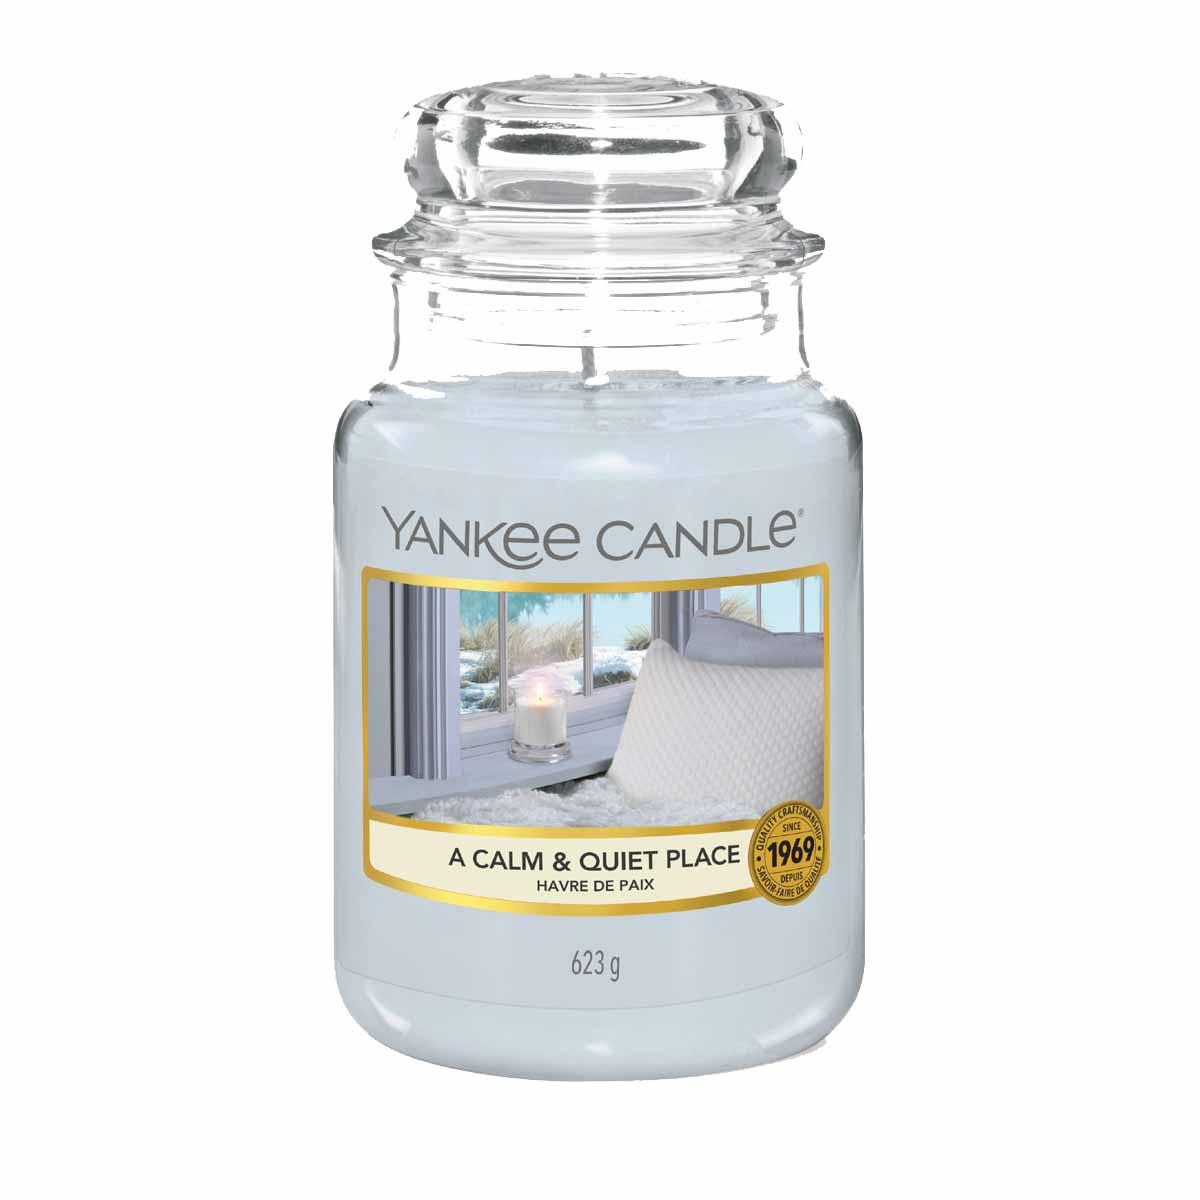 Yankee Candle A Calm & Quiet Place Giara Grande